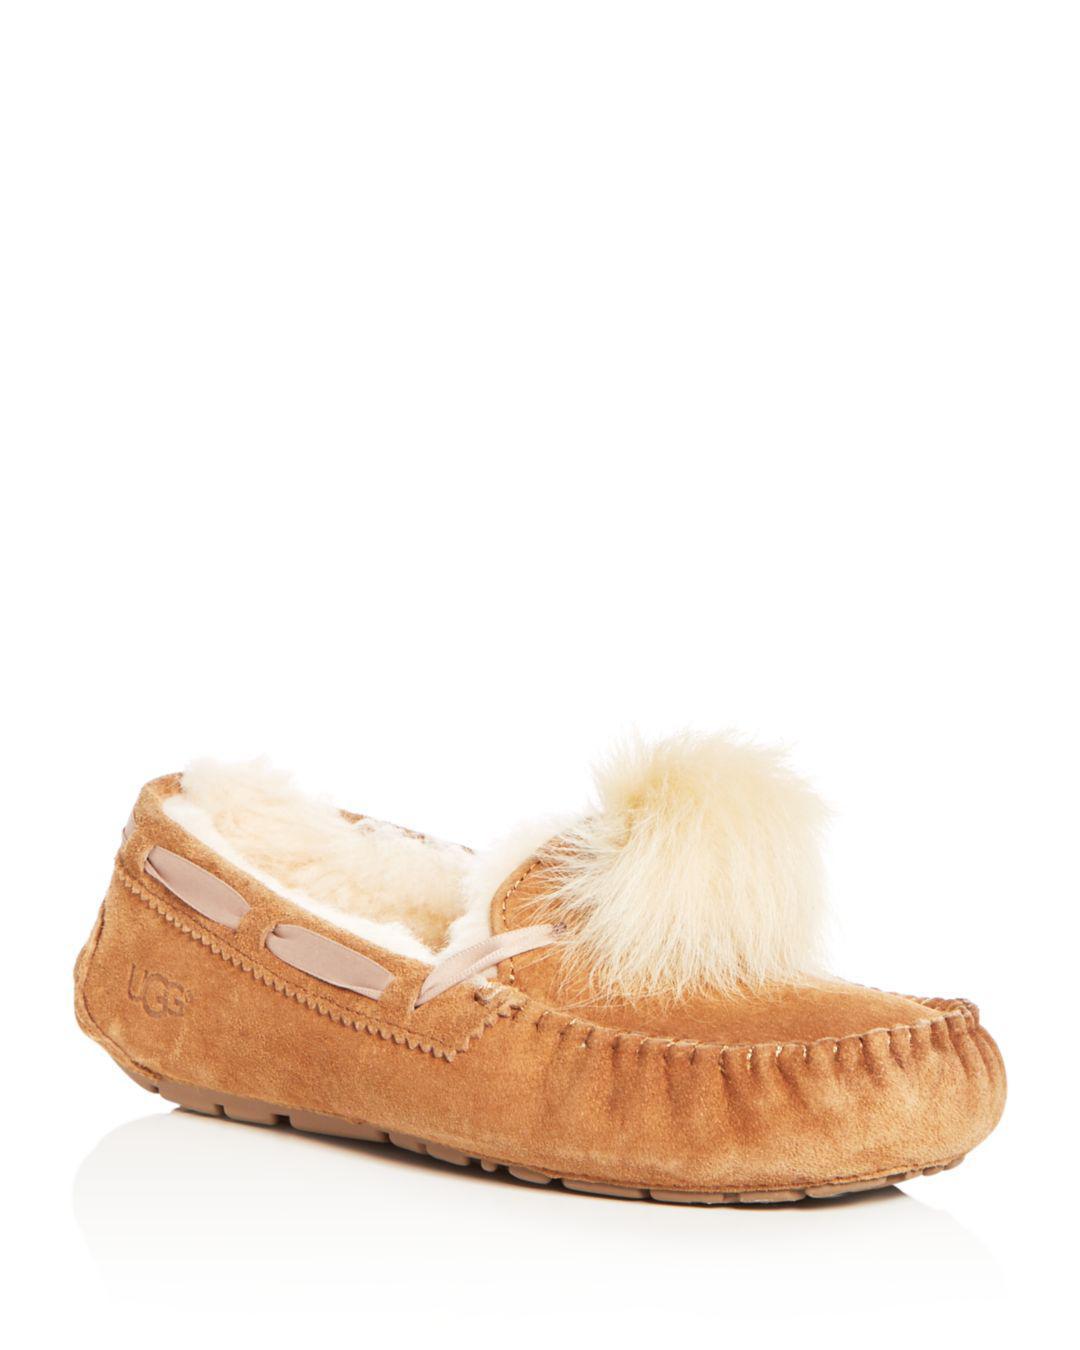 ade55cf7277 Lyst - UGG Women s Dakota Sheepskin Pom-pom Slippers in Brown